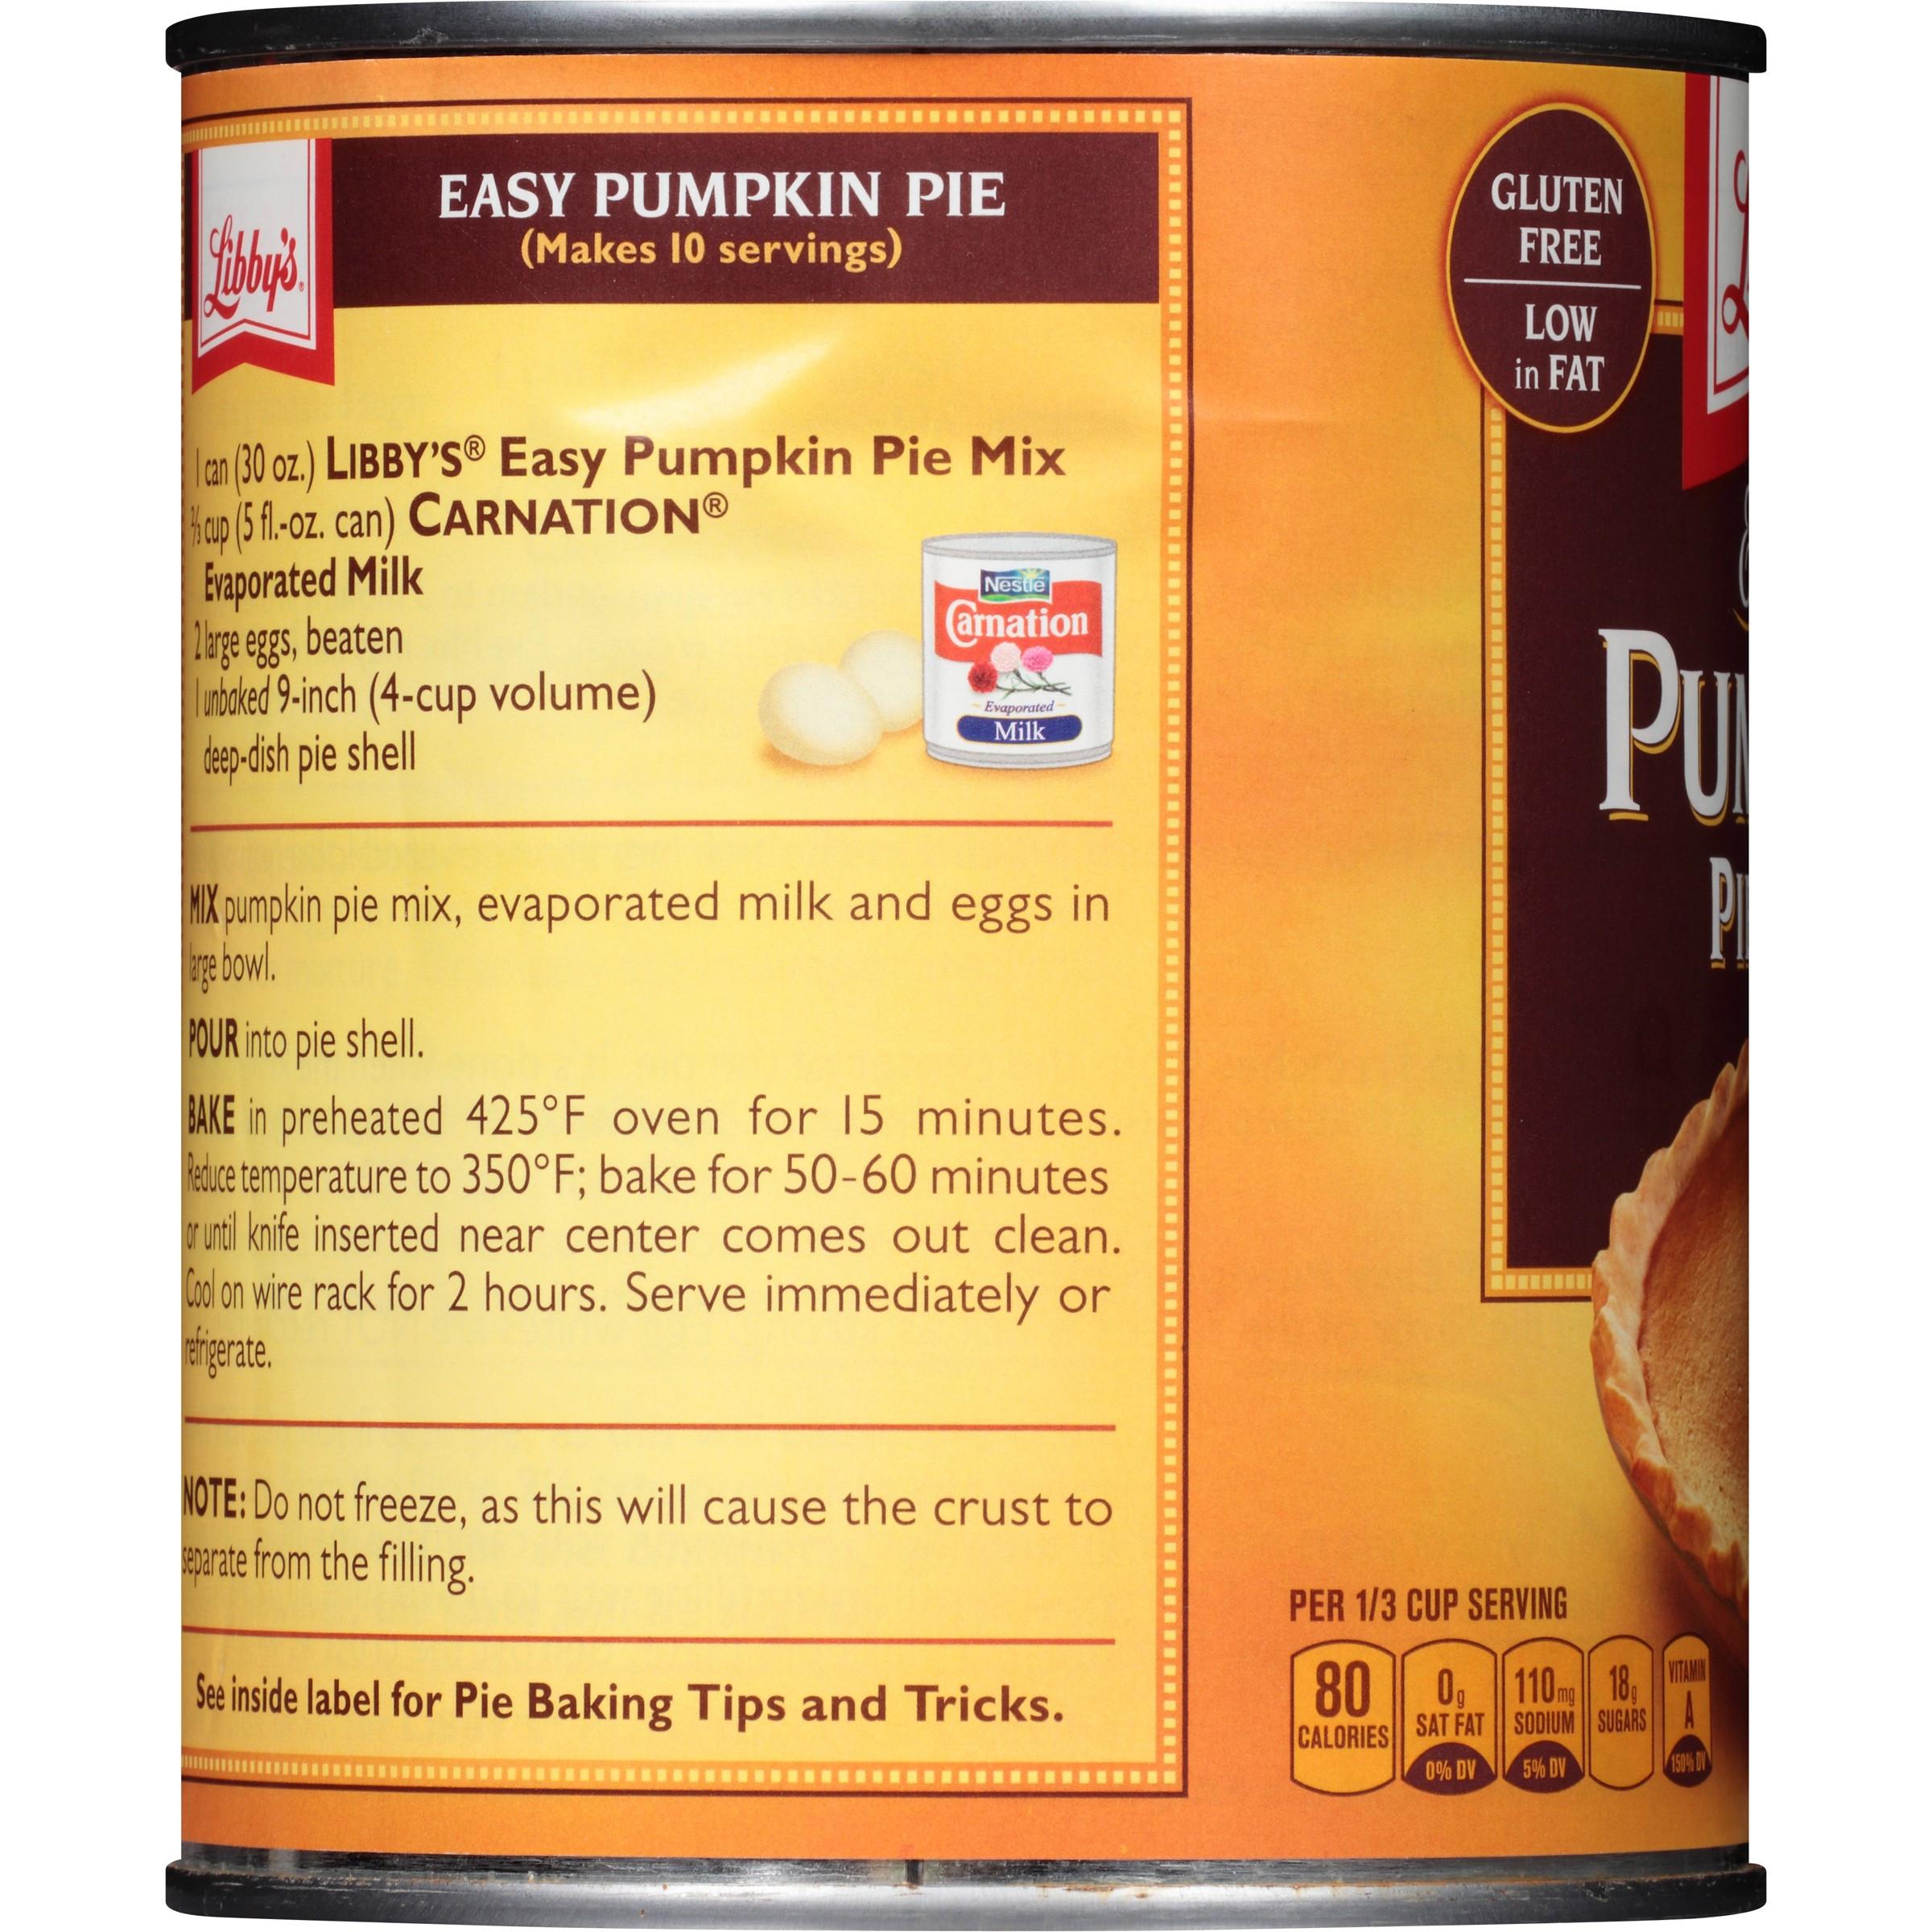 Libbys Pumpkin Pie Recipe  libby s canned pumpkin pie recipe